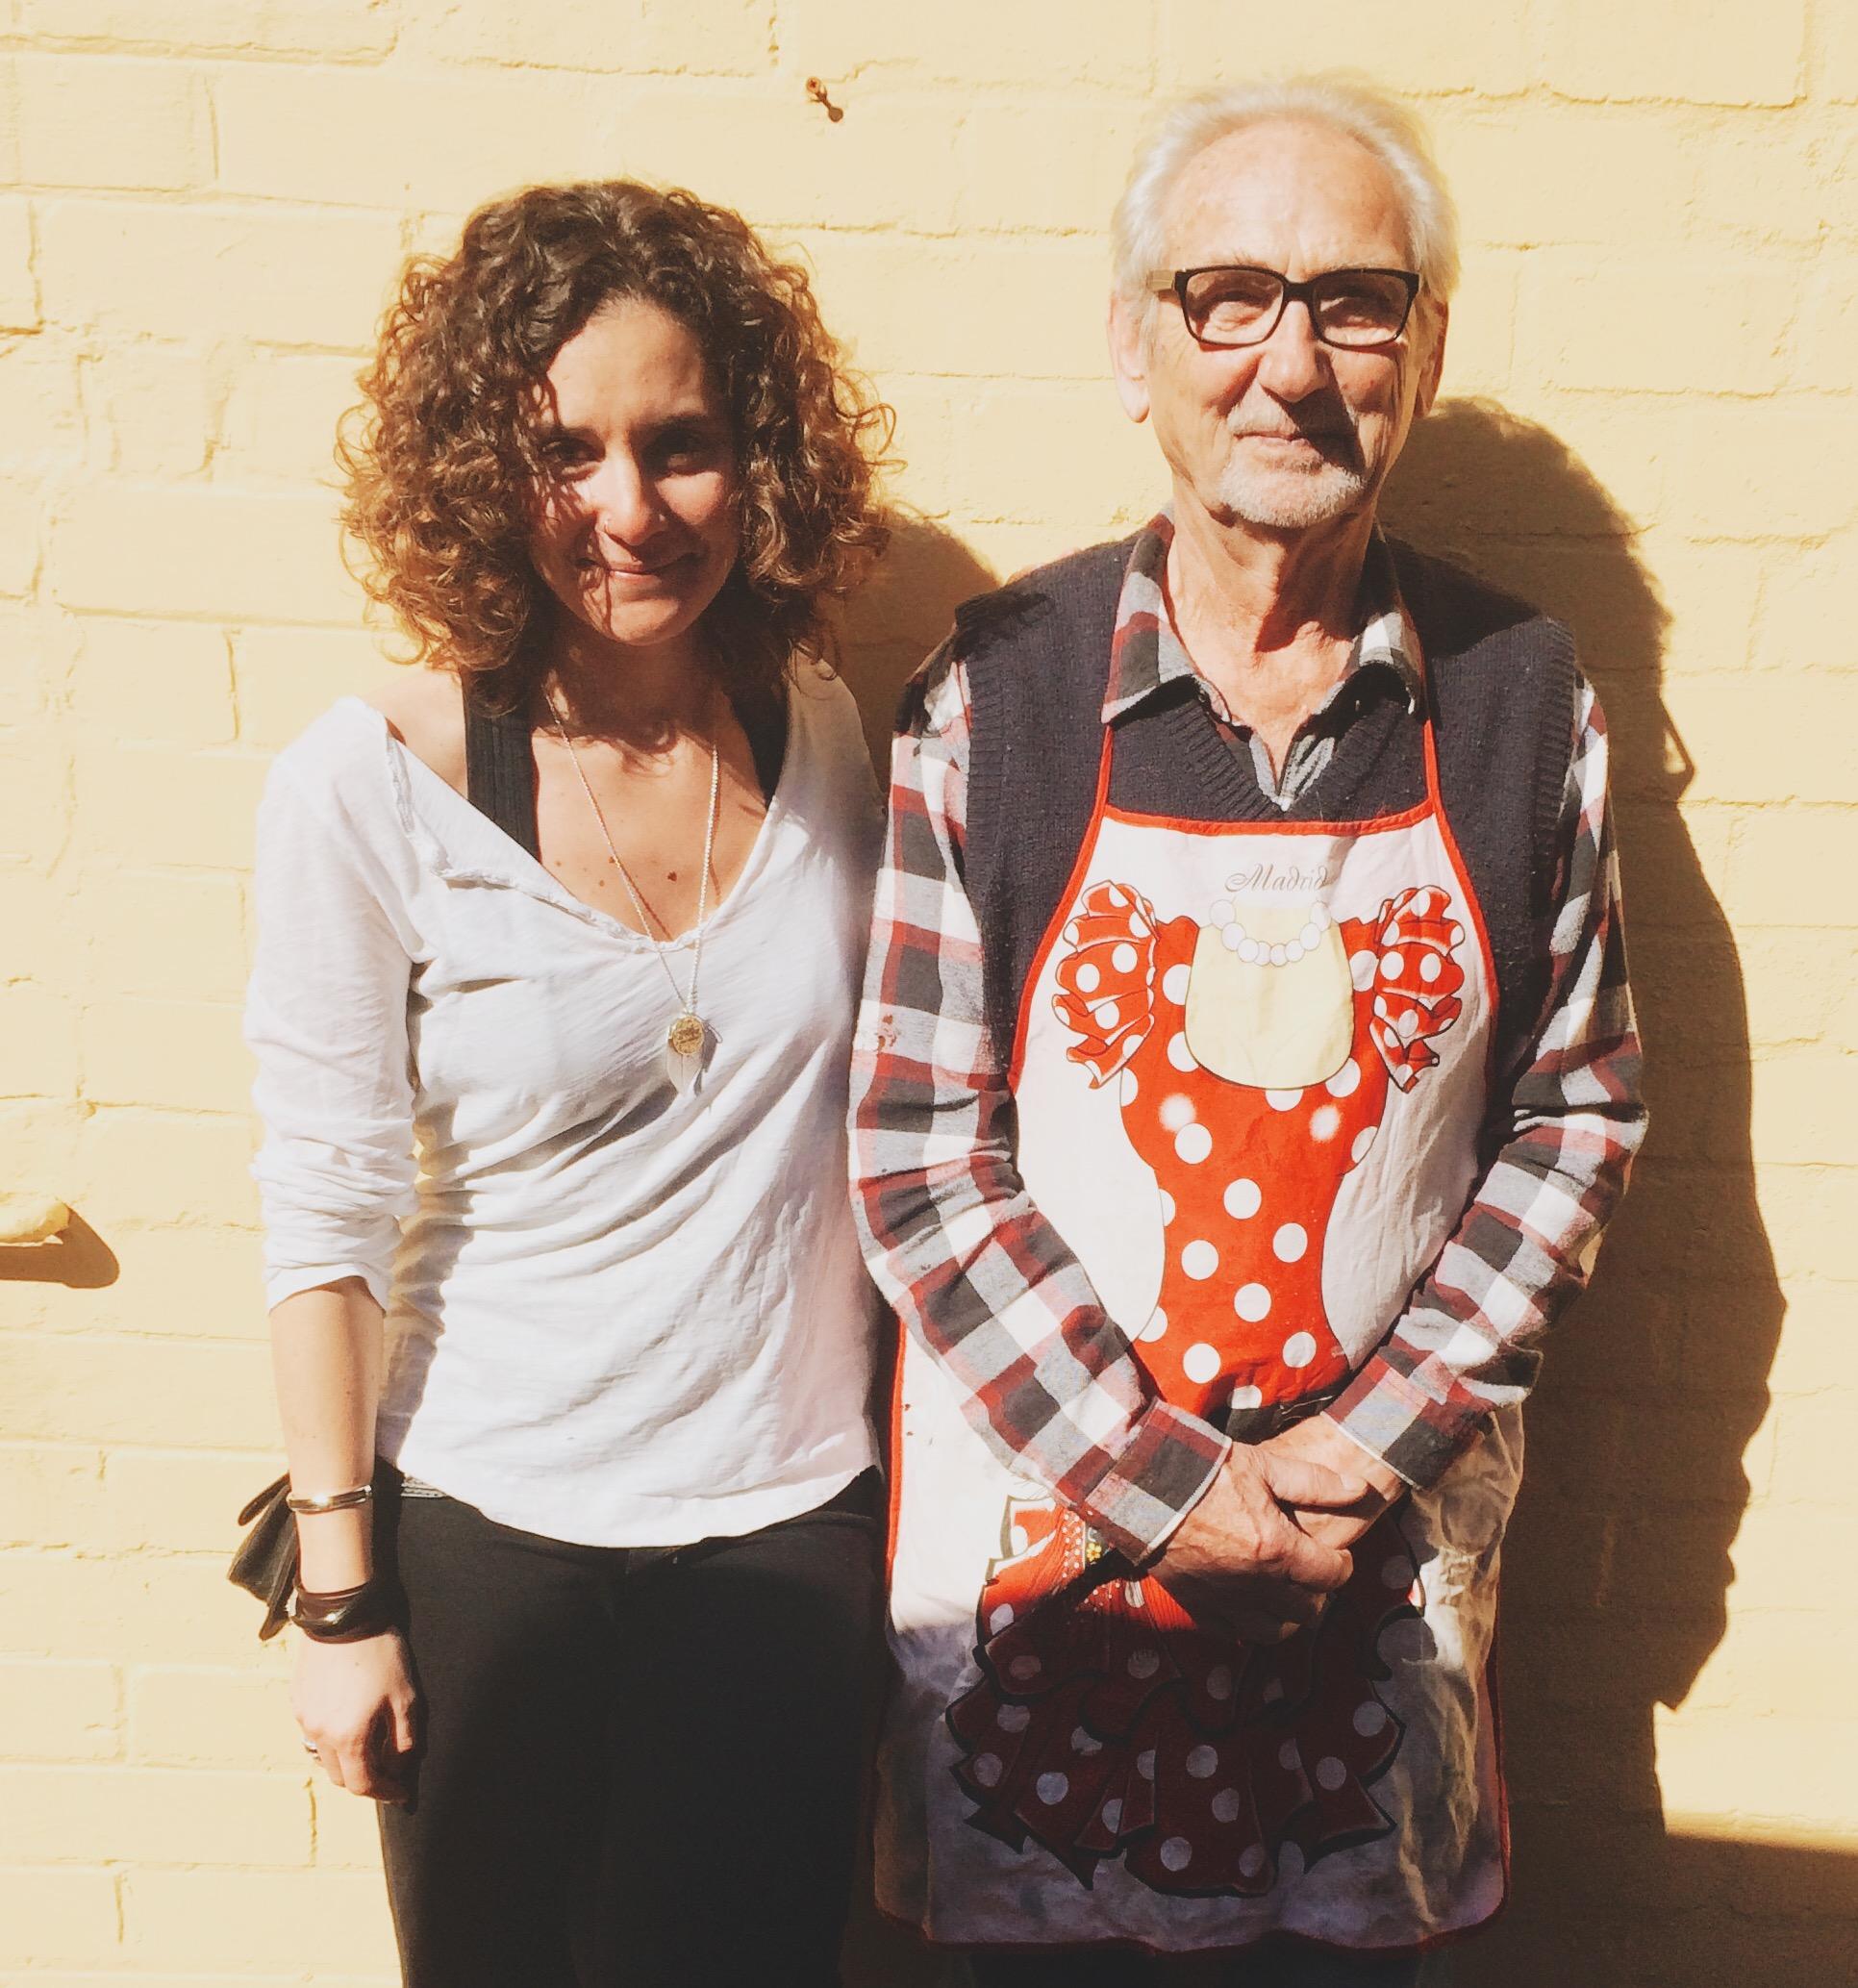 John And Teresa at John's studio in Coogee, Sydney